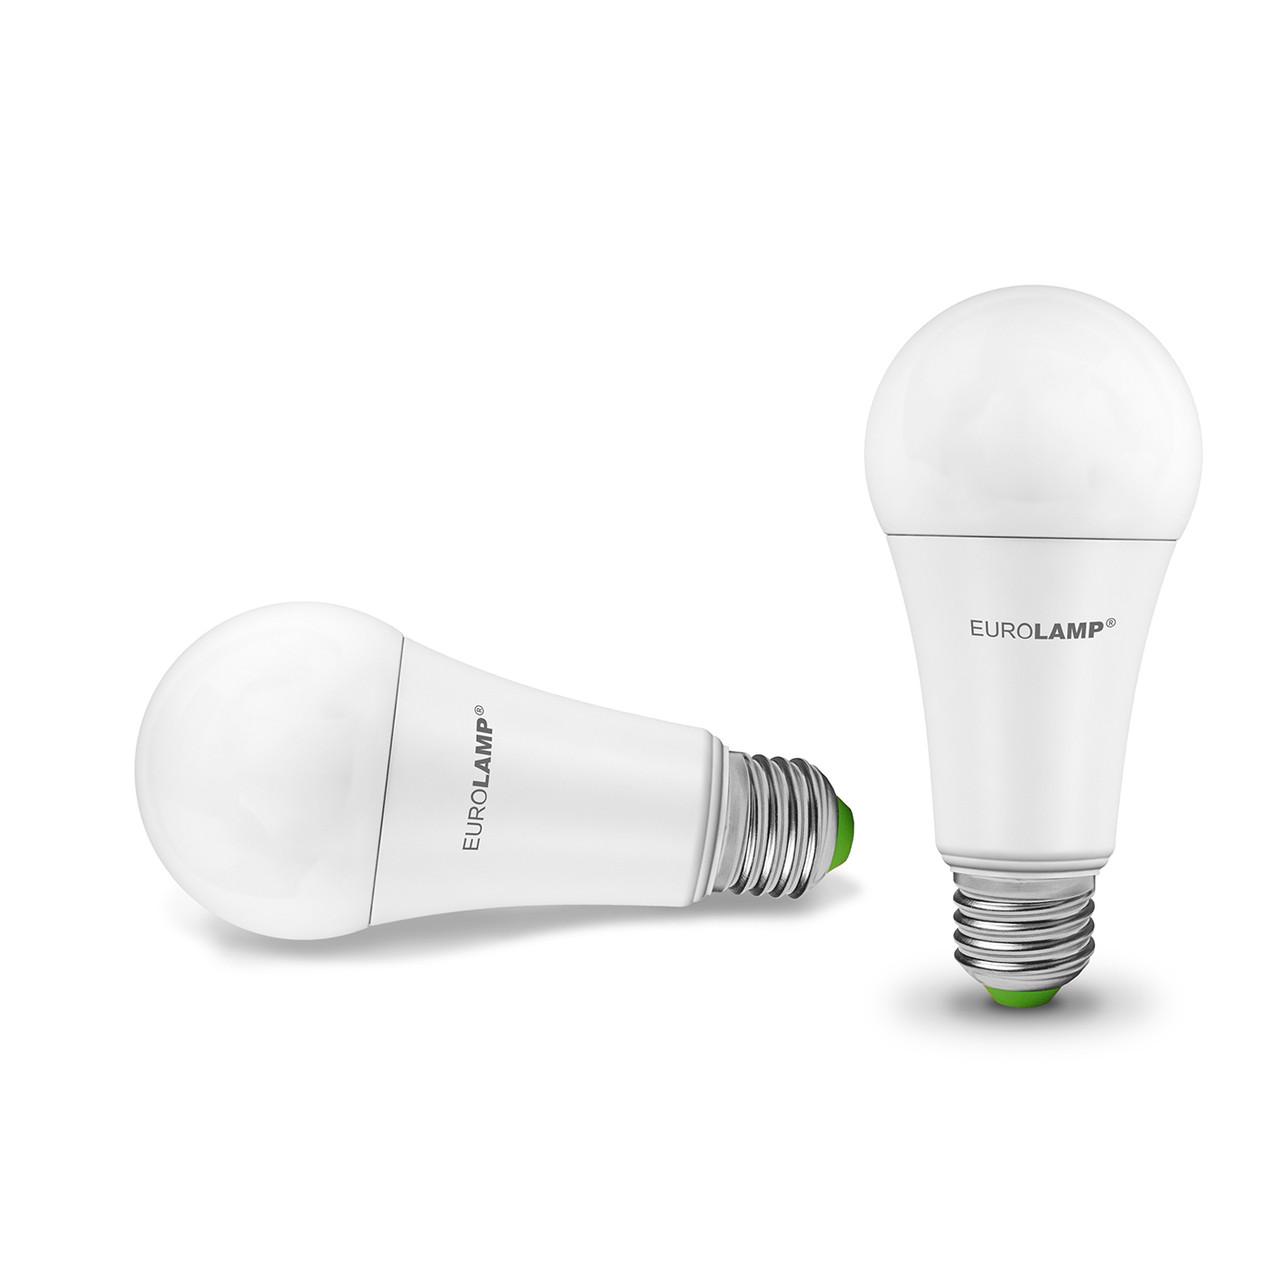 EUROLAMP LED Лампа ЕКО А75 20W E27 3000K